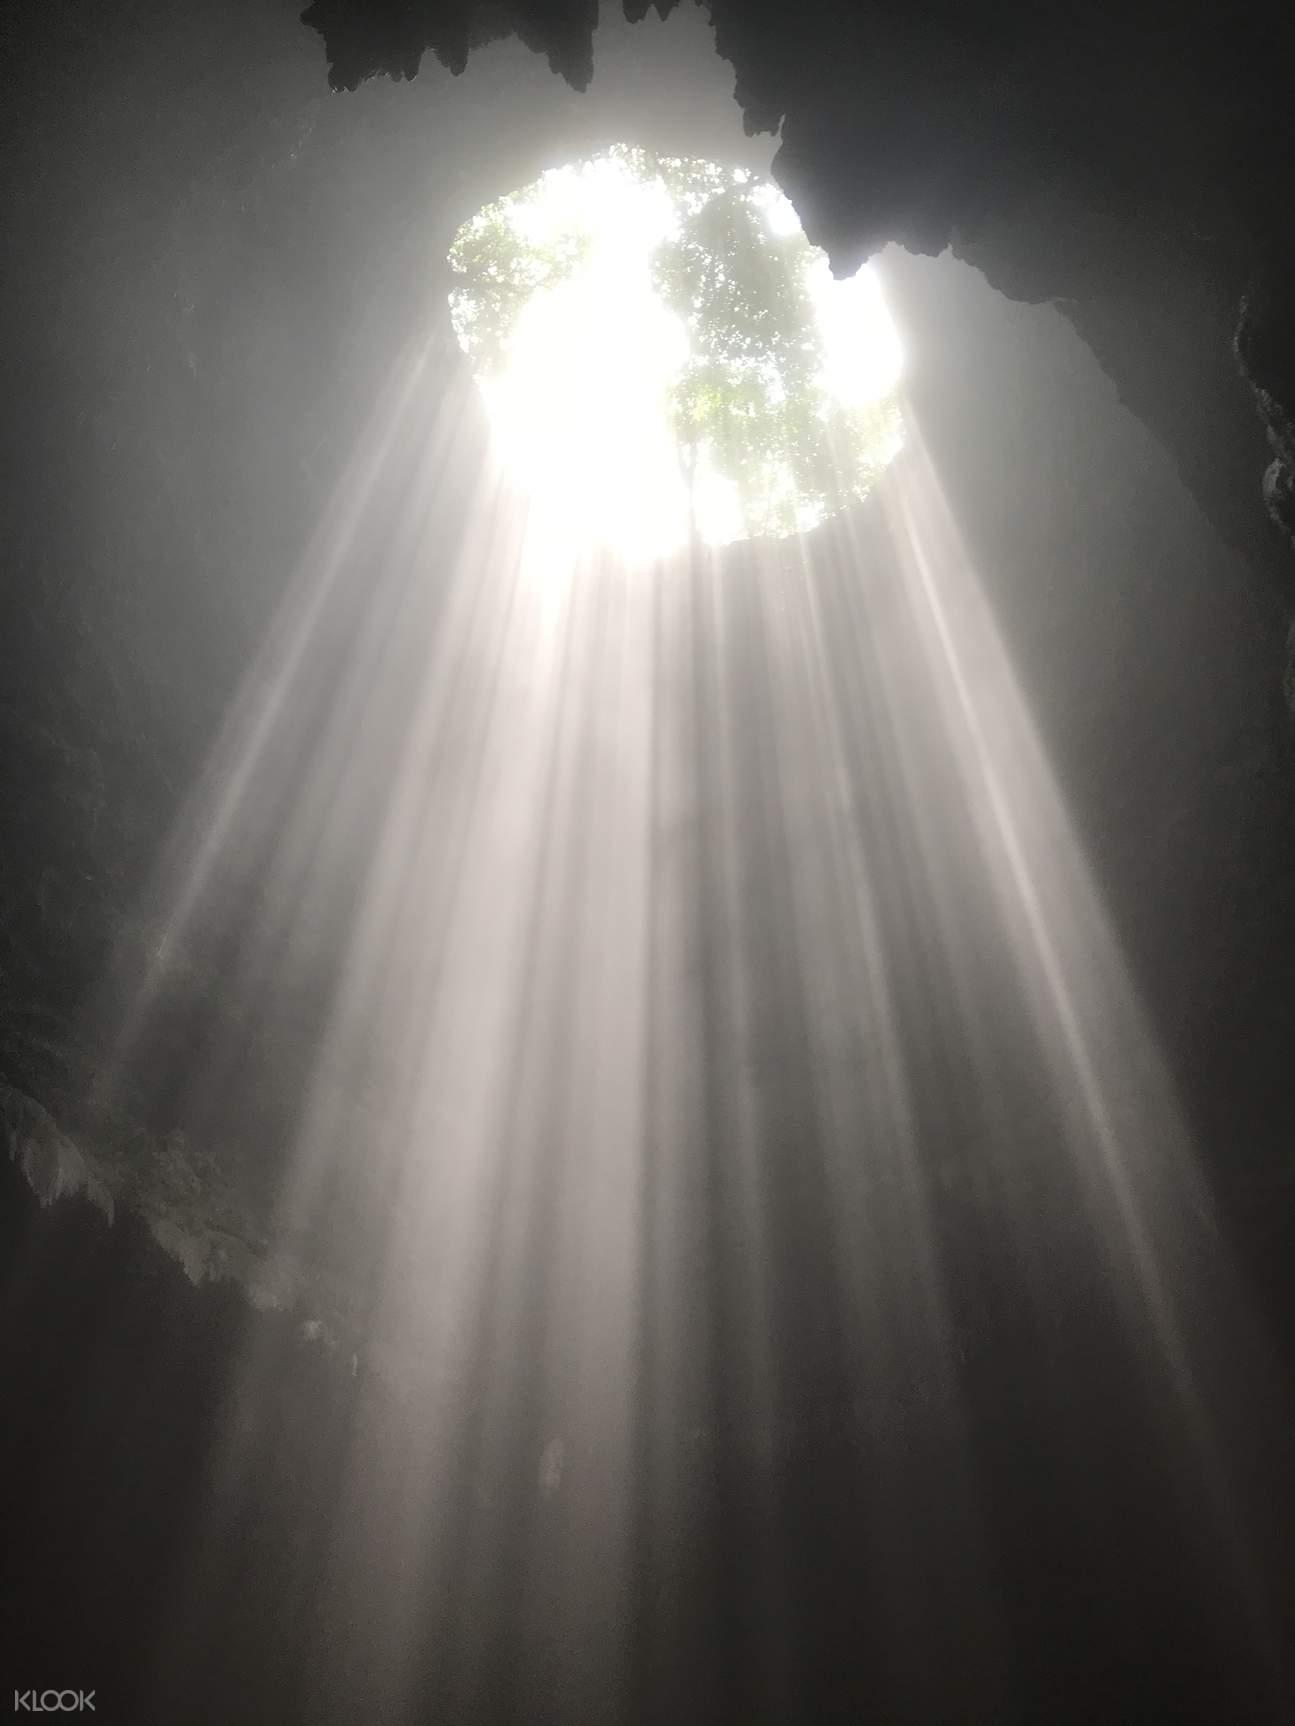 Jomblang洞穴,普兰巴南,日惹探洞,爪哇探洞,爪哇洞穴,日惹洞穴